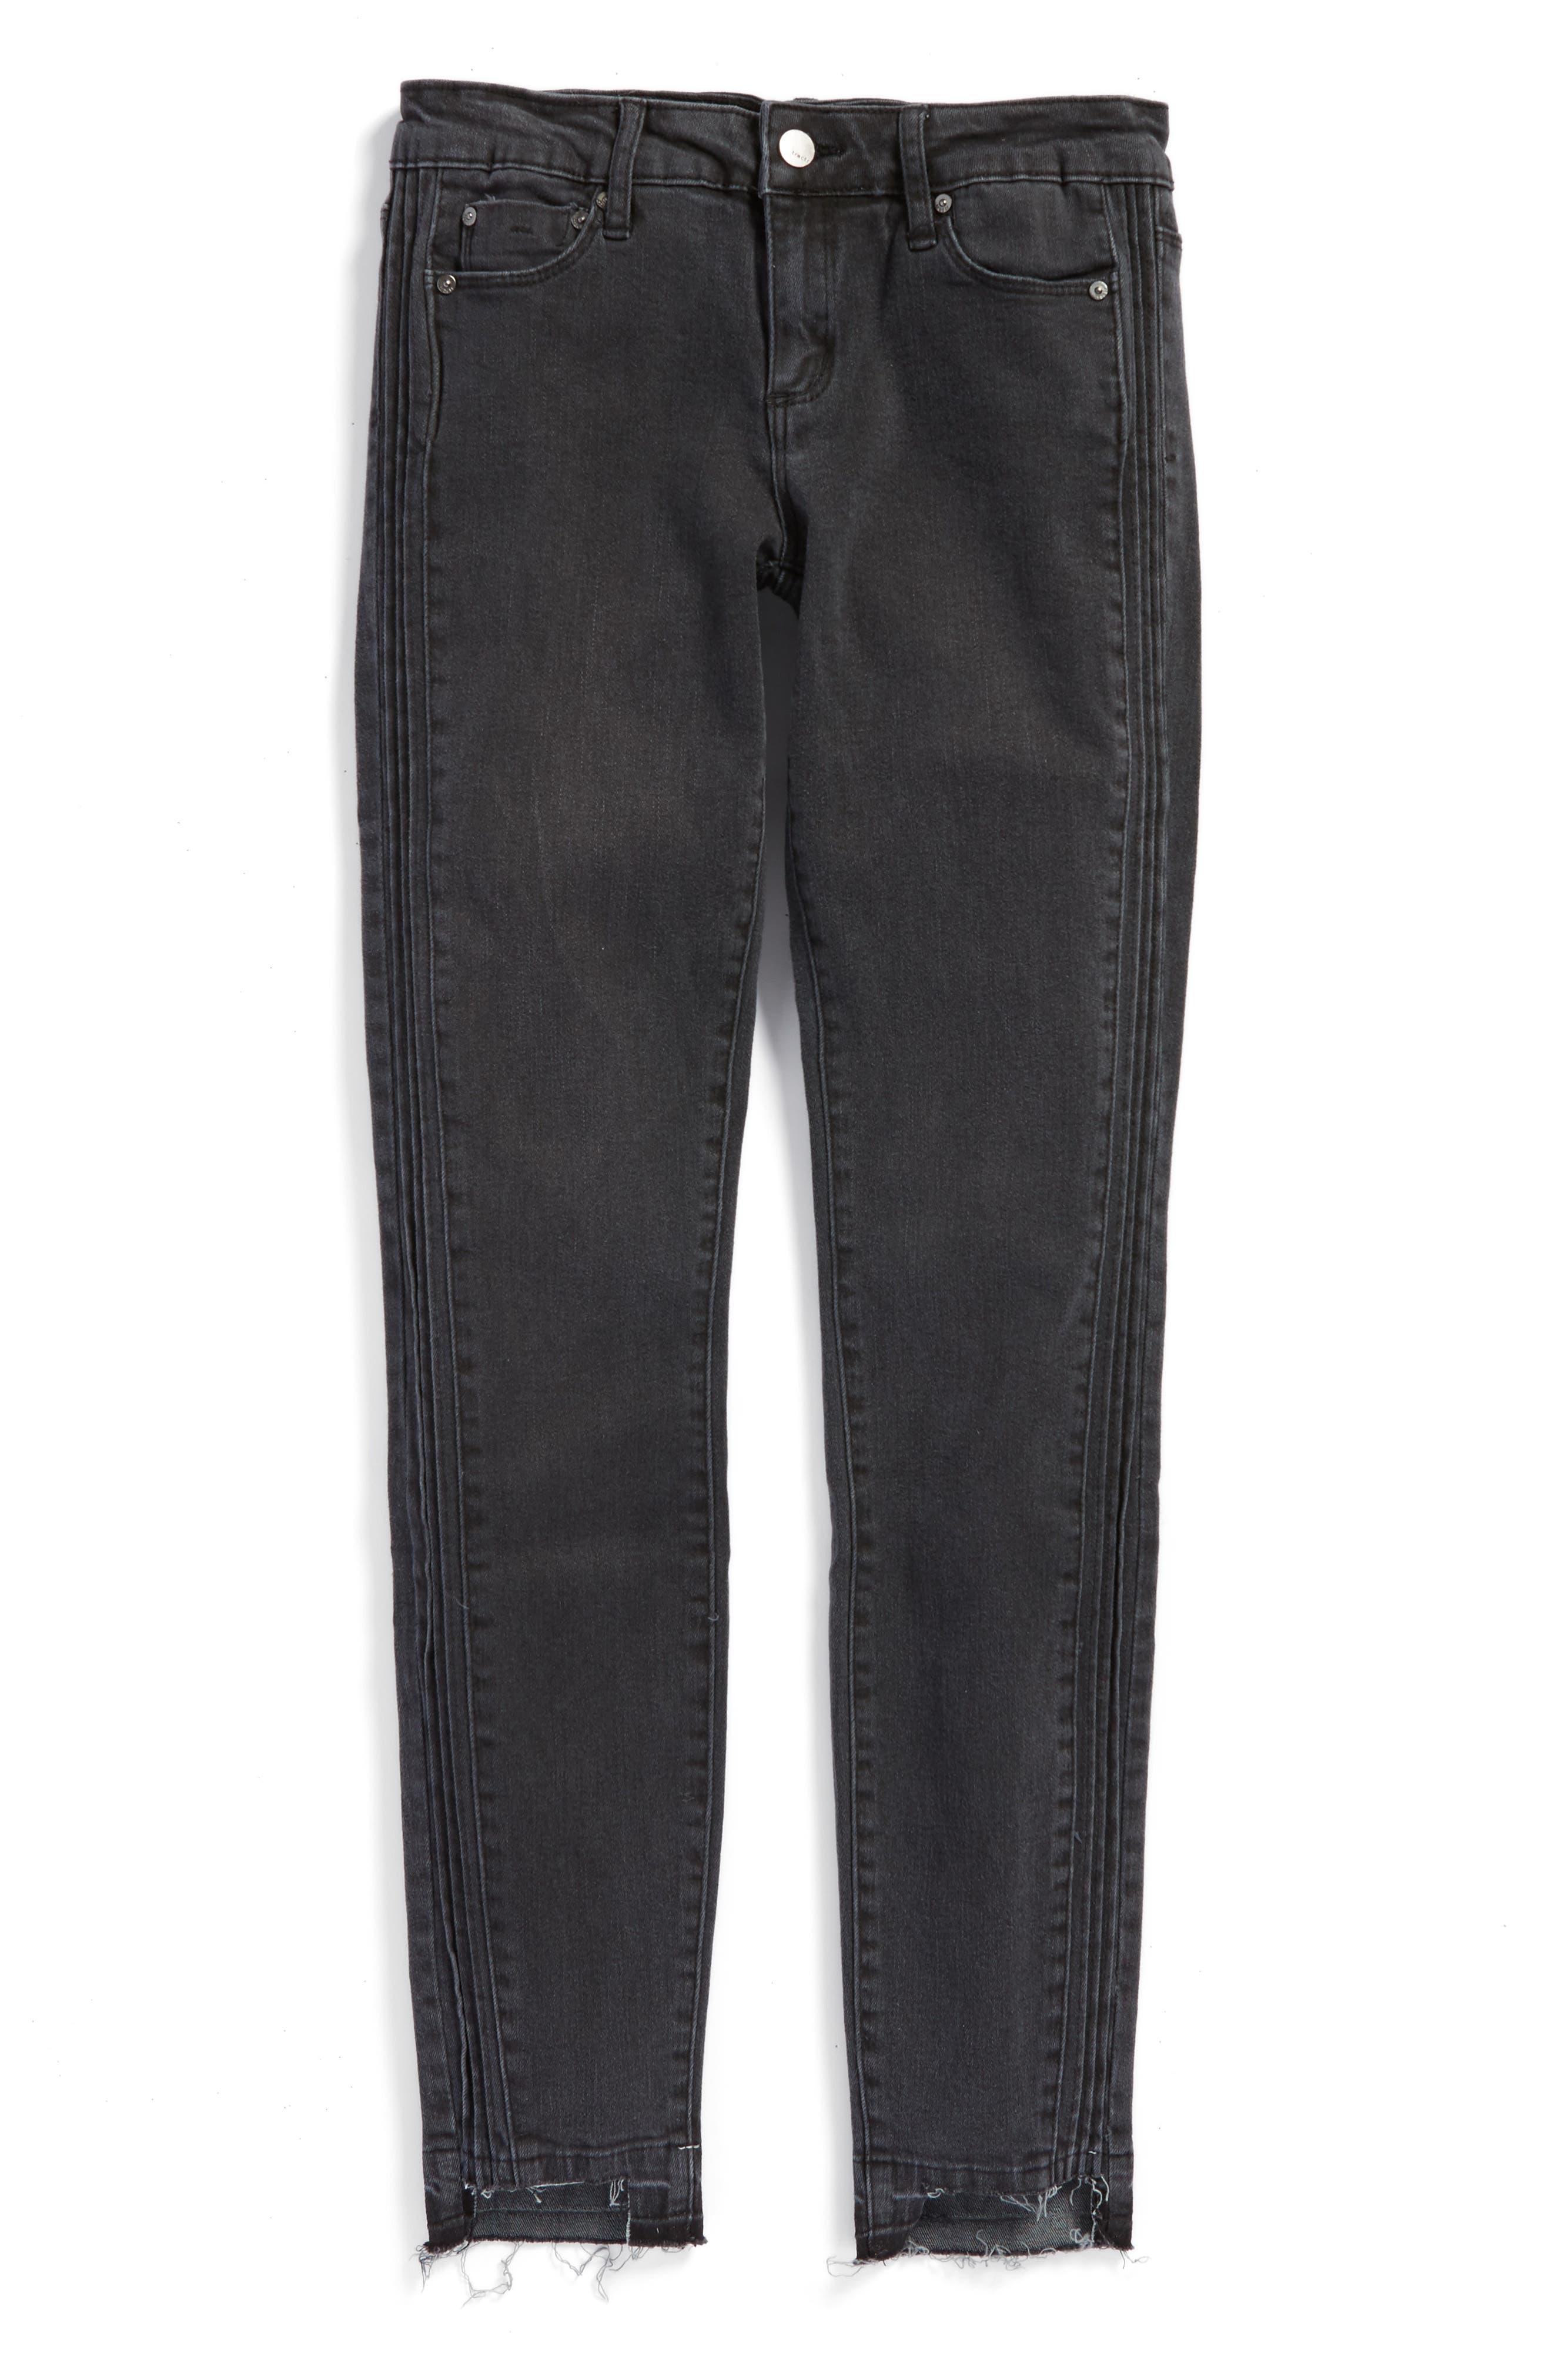 Tractr Tuxedo Step Hem Skinny Jeans